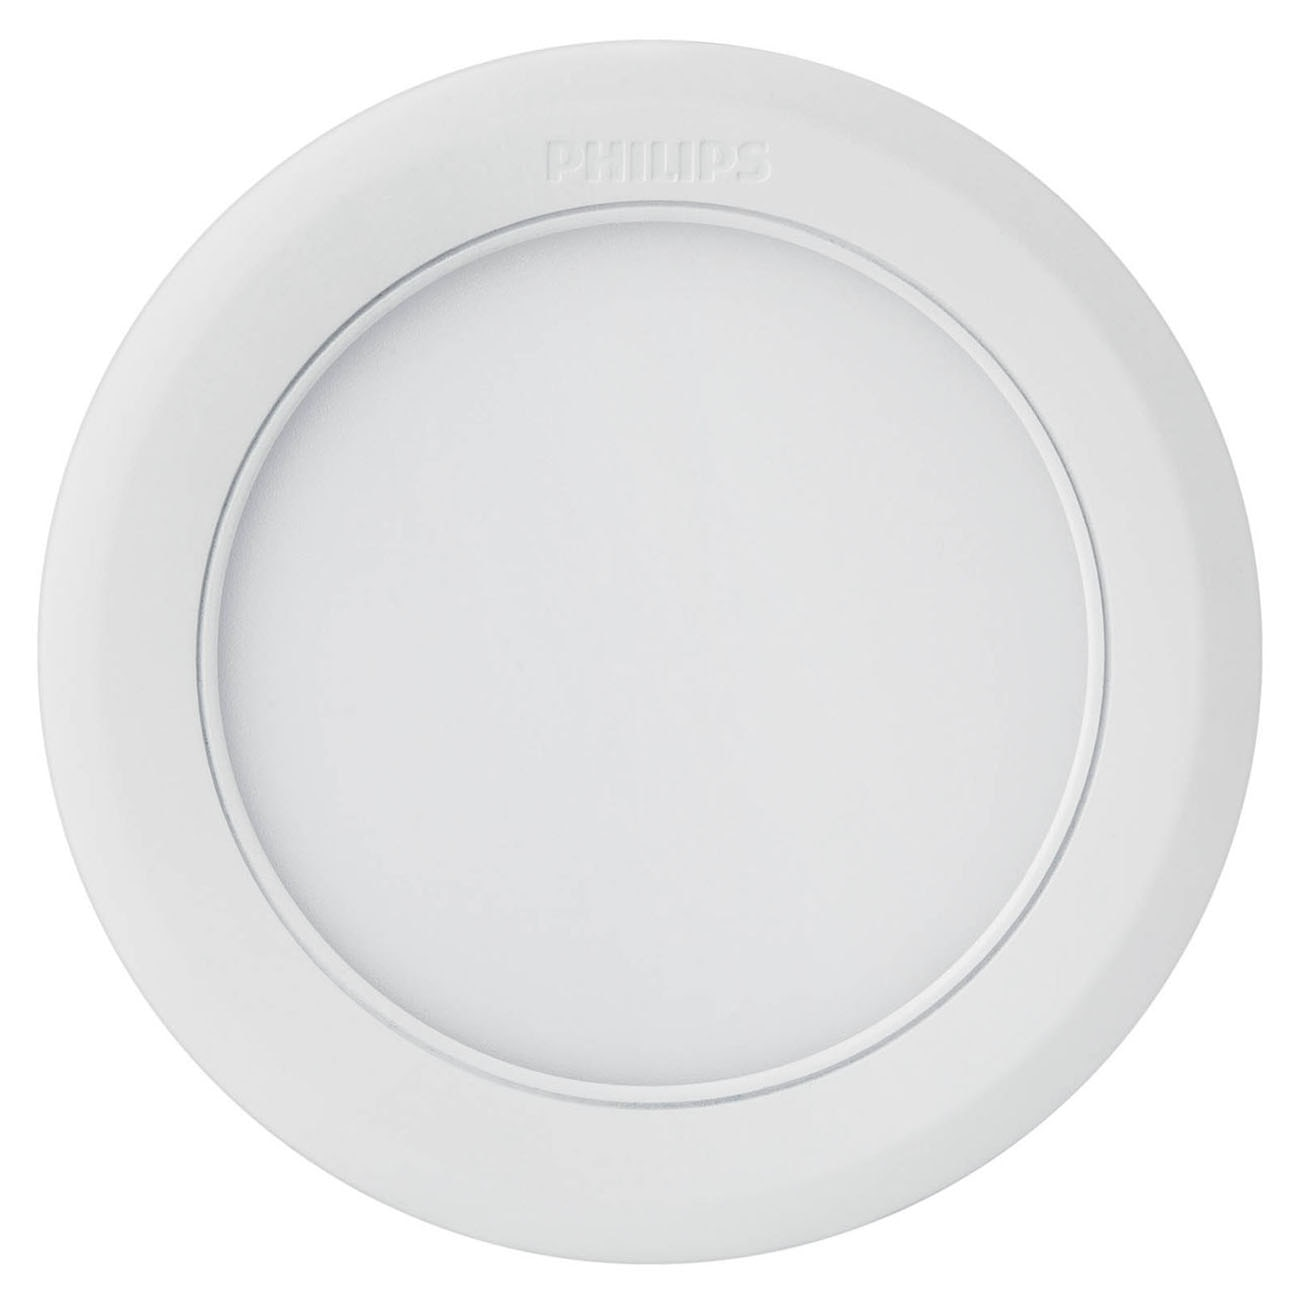 Fotografie Spot LED incastrat Philips Marcasite, 9W (63W), 860 lm, lumina alba rece